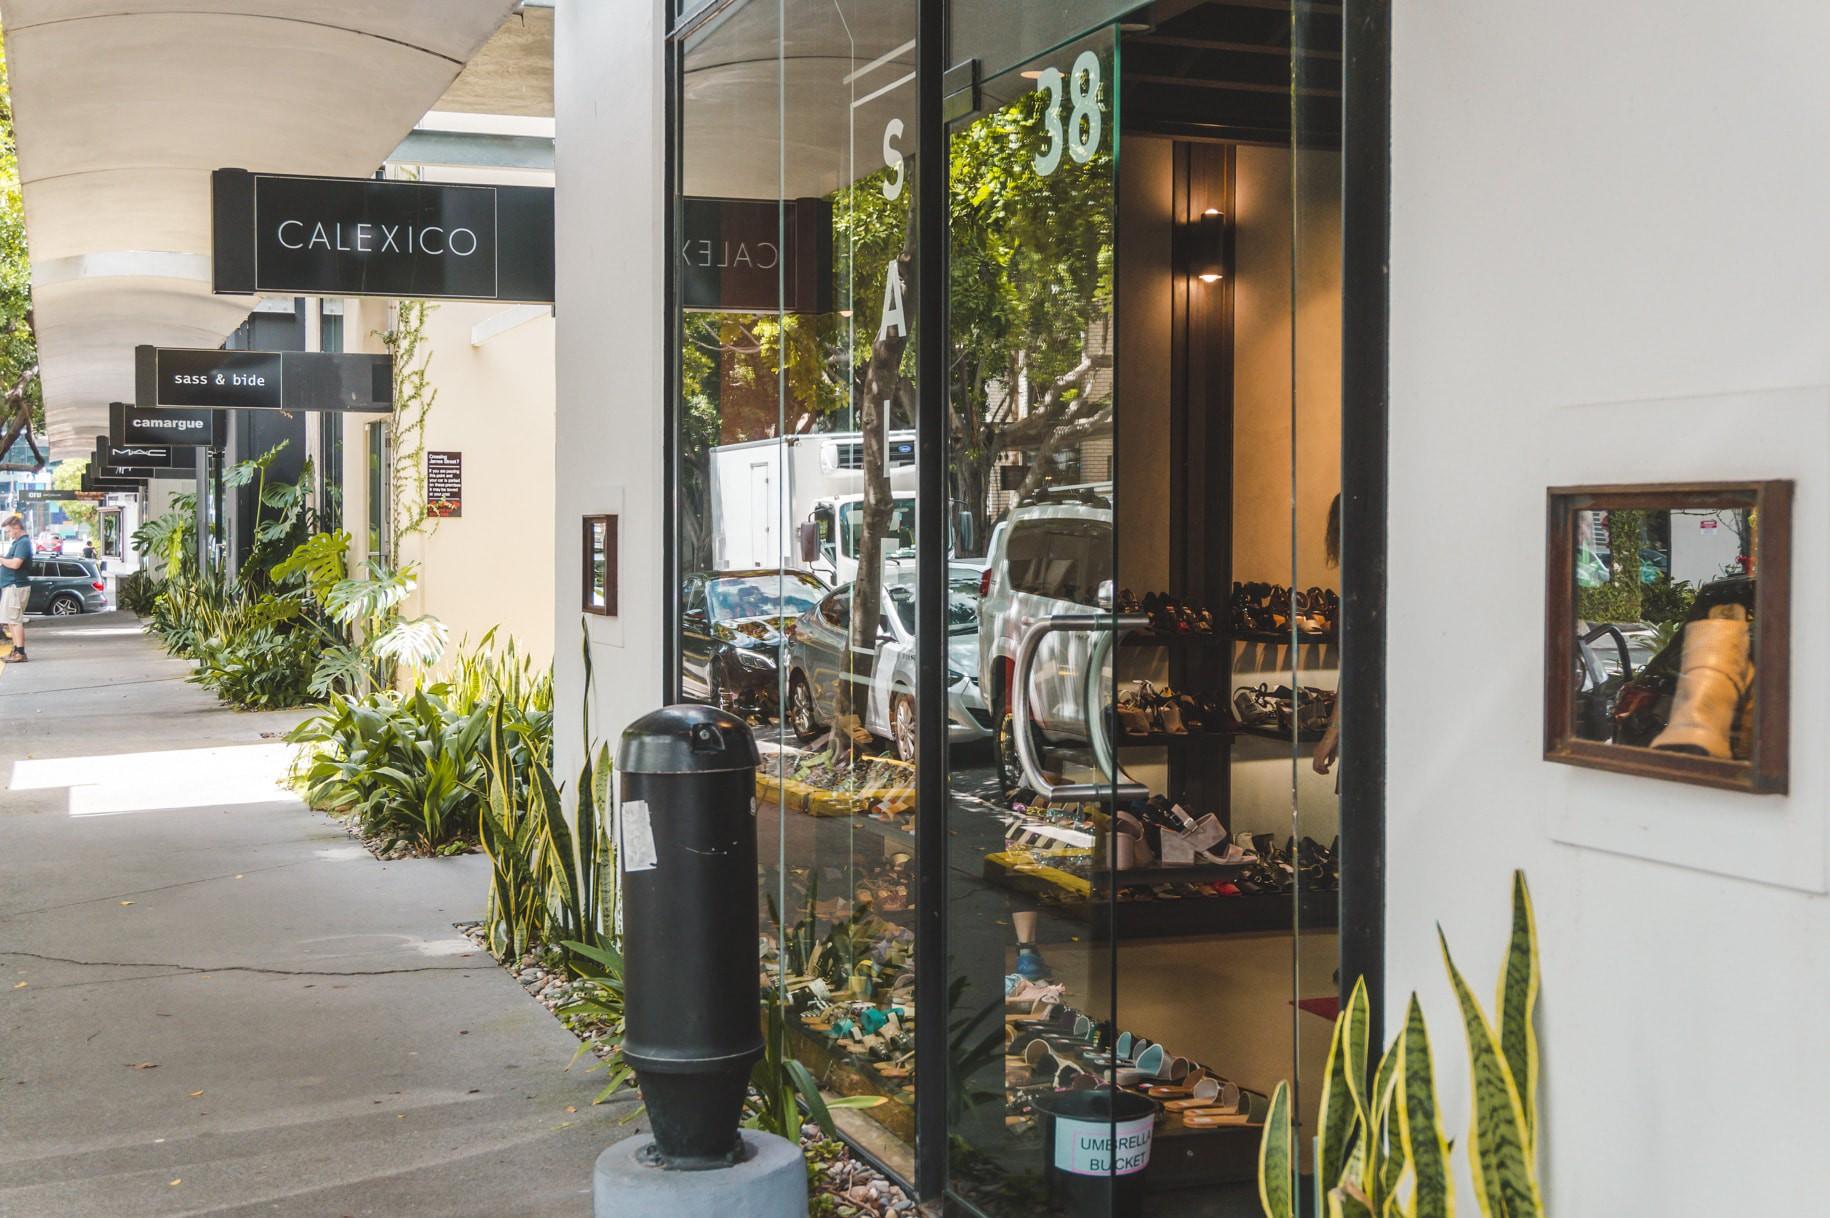 Phenomenal 10 Awesome Independent Stores In Brisbane Australia Download Free Architecture Designs Sospemadebymaigaardcom